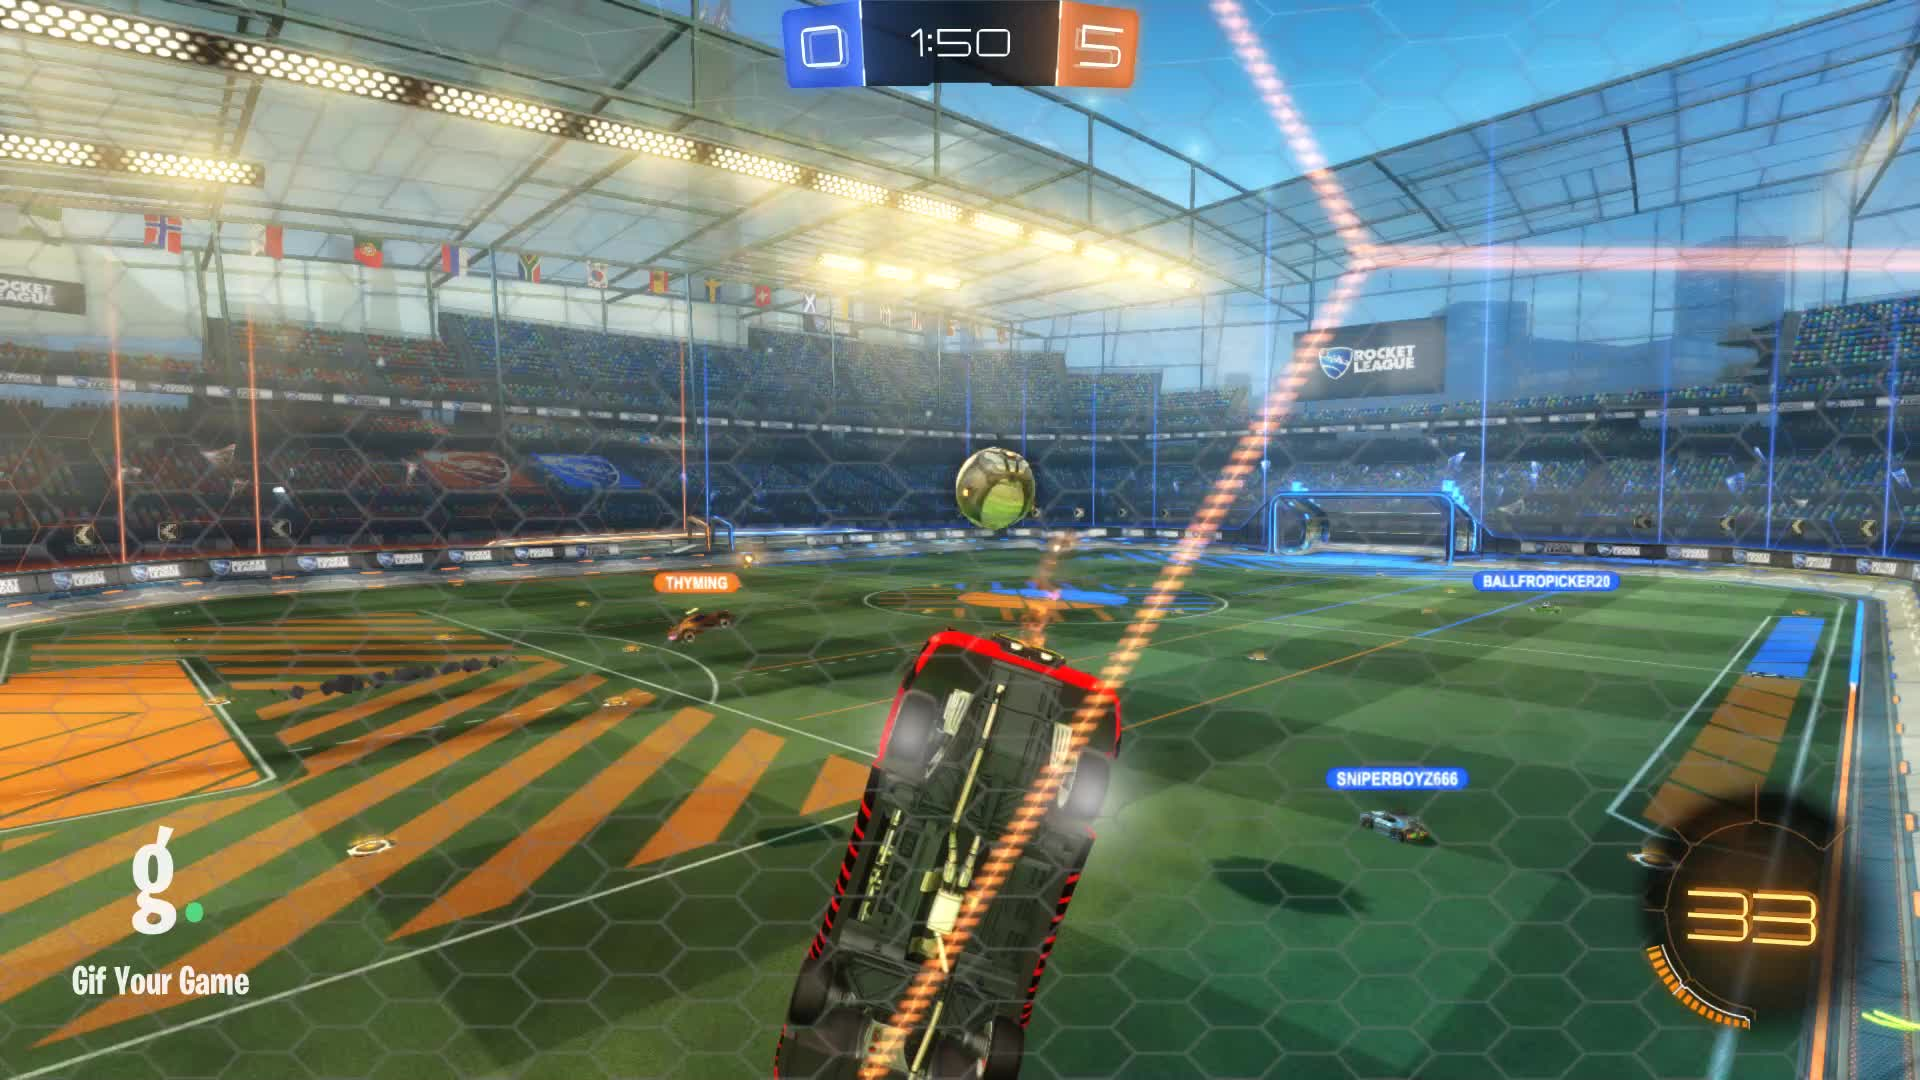 Gif Your Game, GifYourGame, Goal, Rocket League, RocketLeague, datboi, Goal 6: datboi GIFs